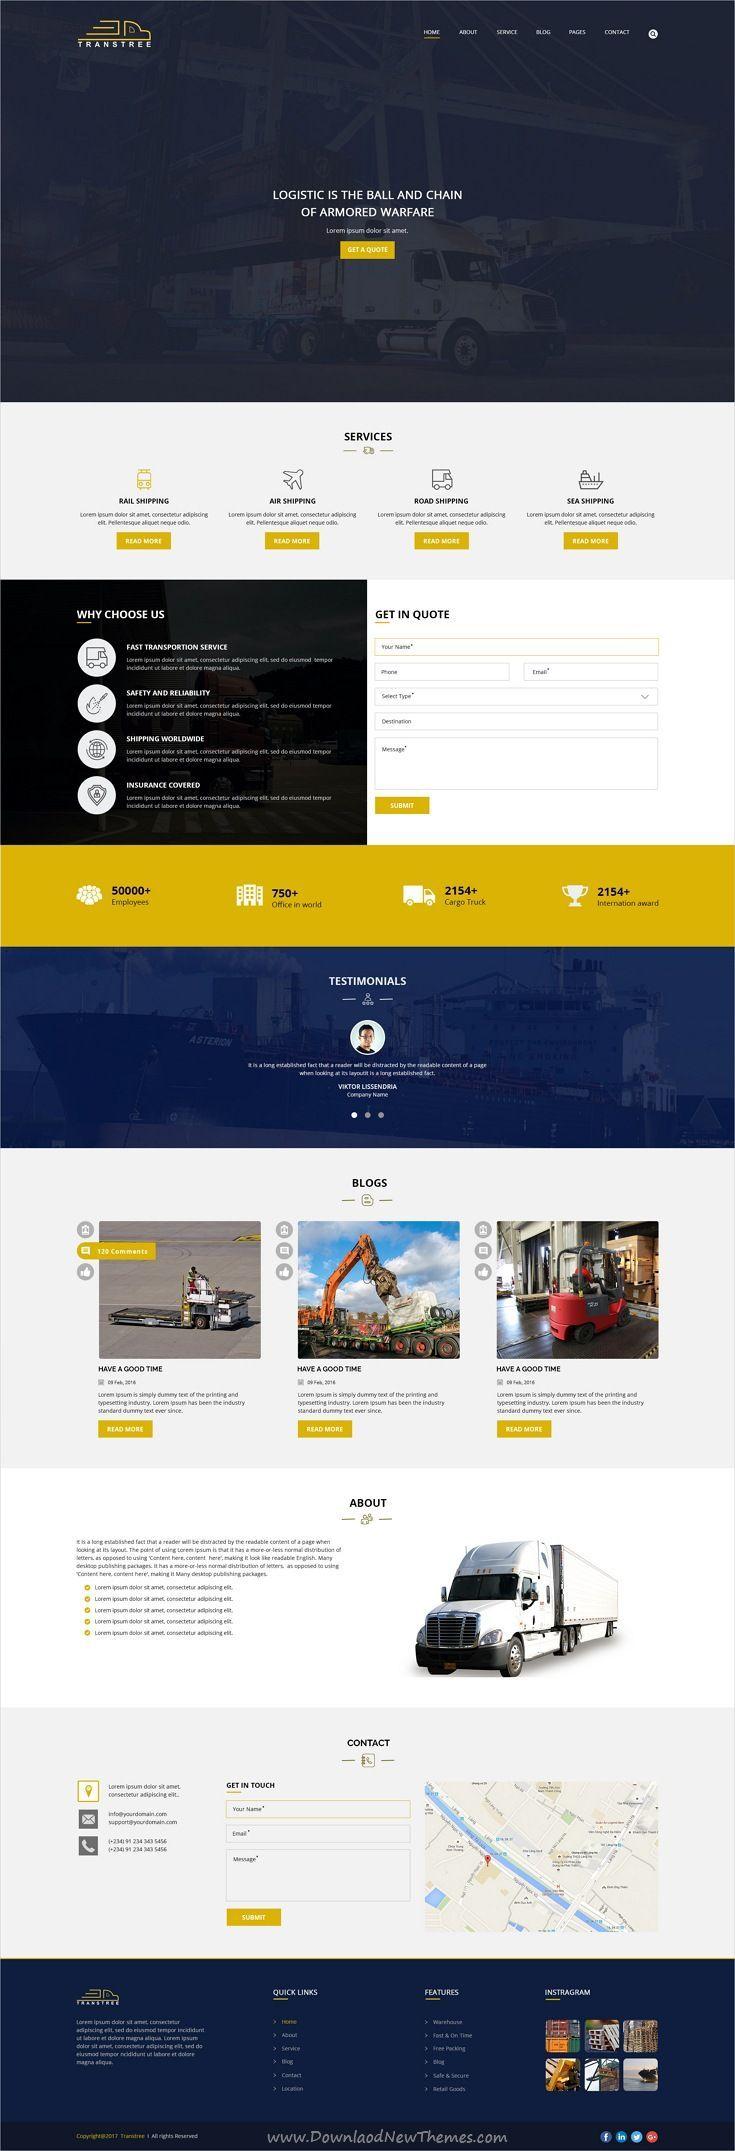 Transtree Psd Template Website Design Web Design Tips Web Design Tools